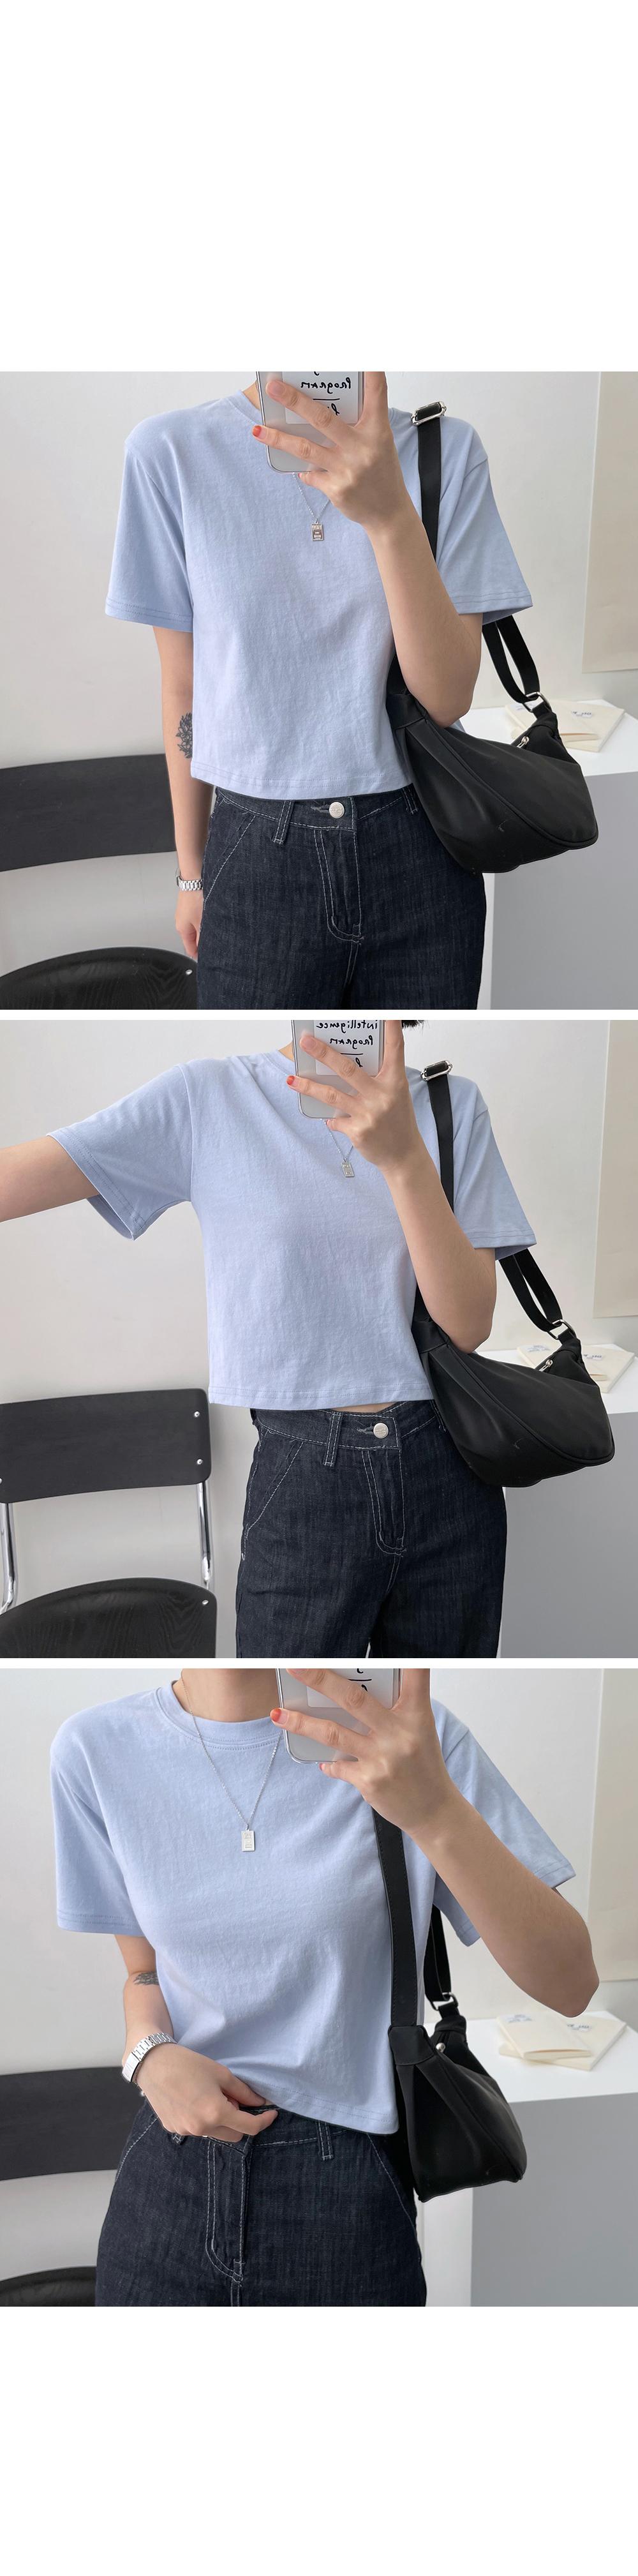 dress product image-S1L13